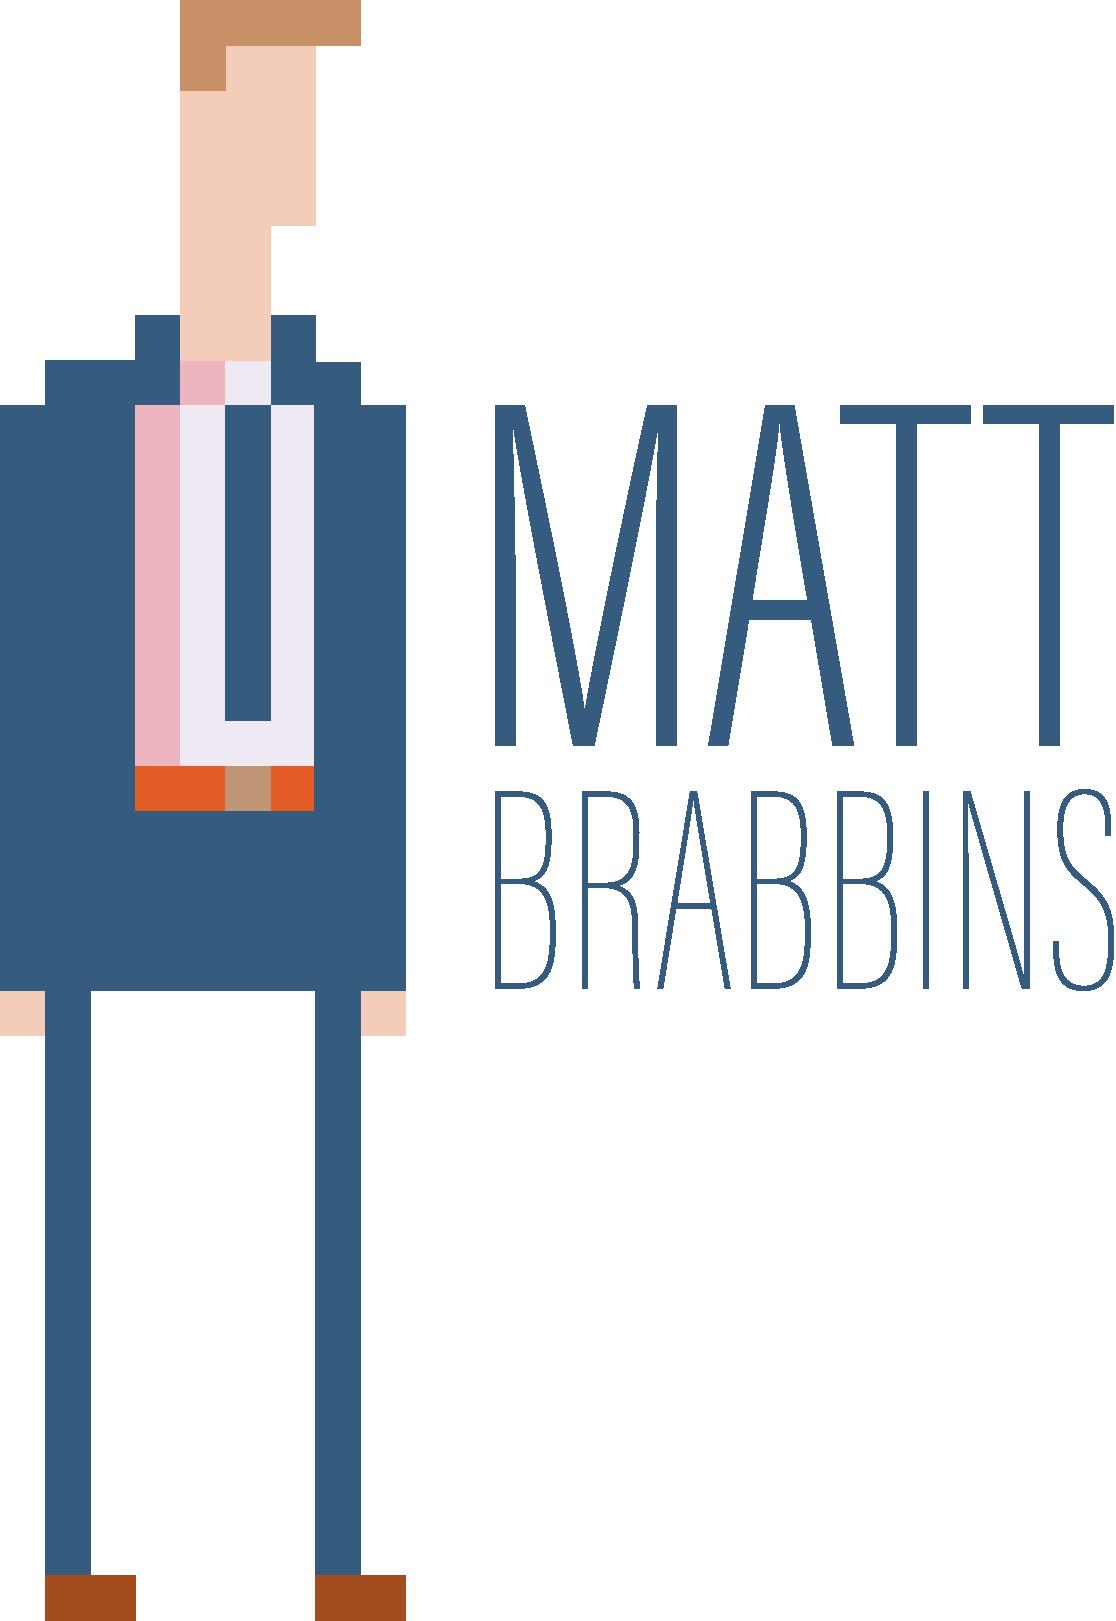 Matt Brabbins